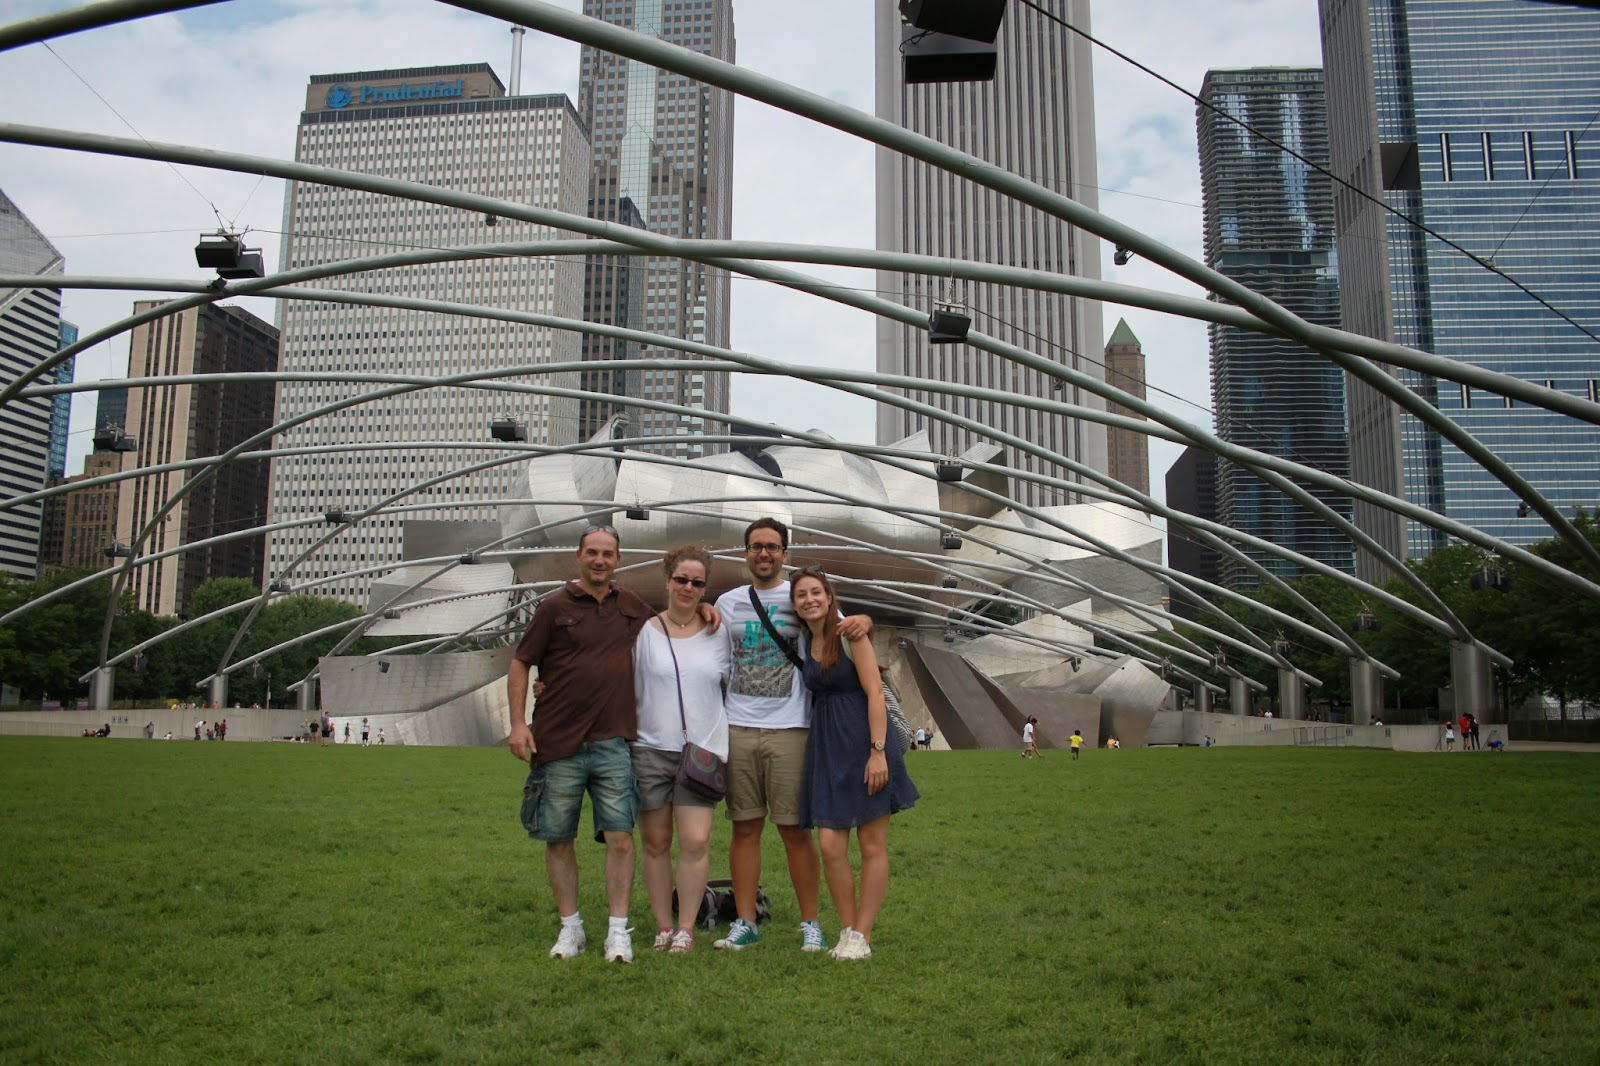 Chicago Jay Pritzker Pavilion